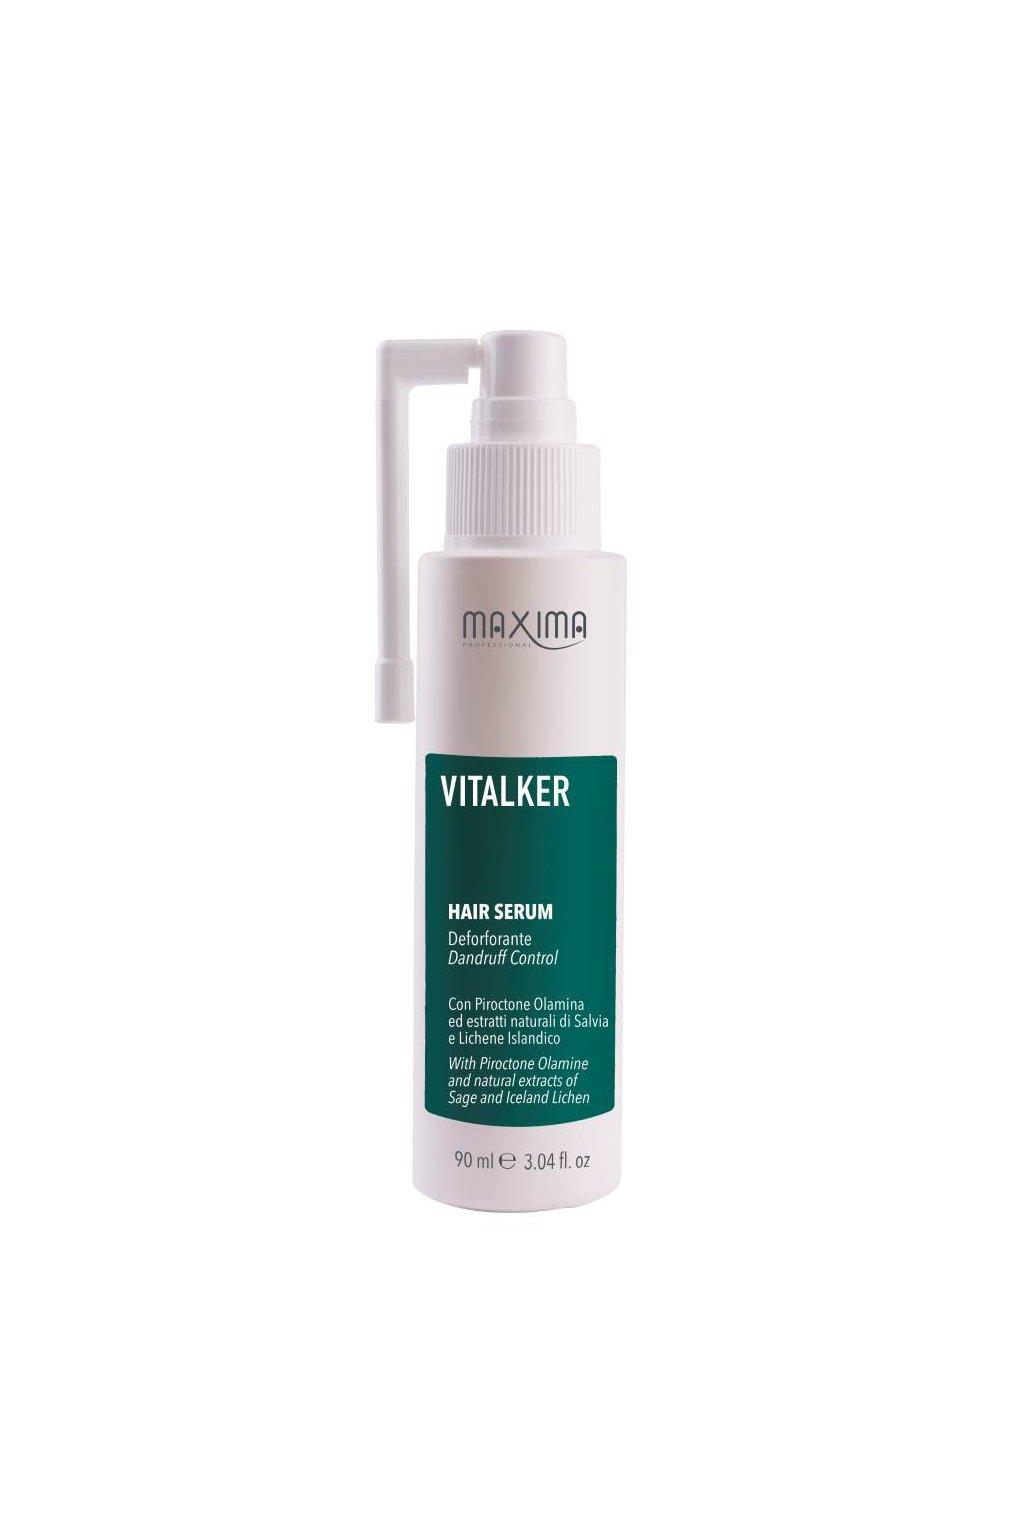 Maxima VITALKER Tonikum proti suchými i mastným lupům 90ml